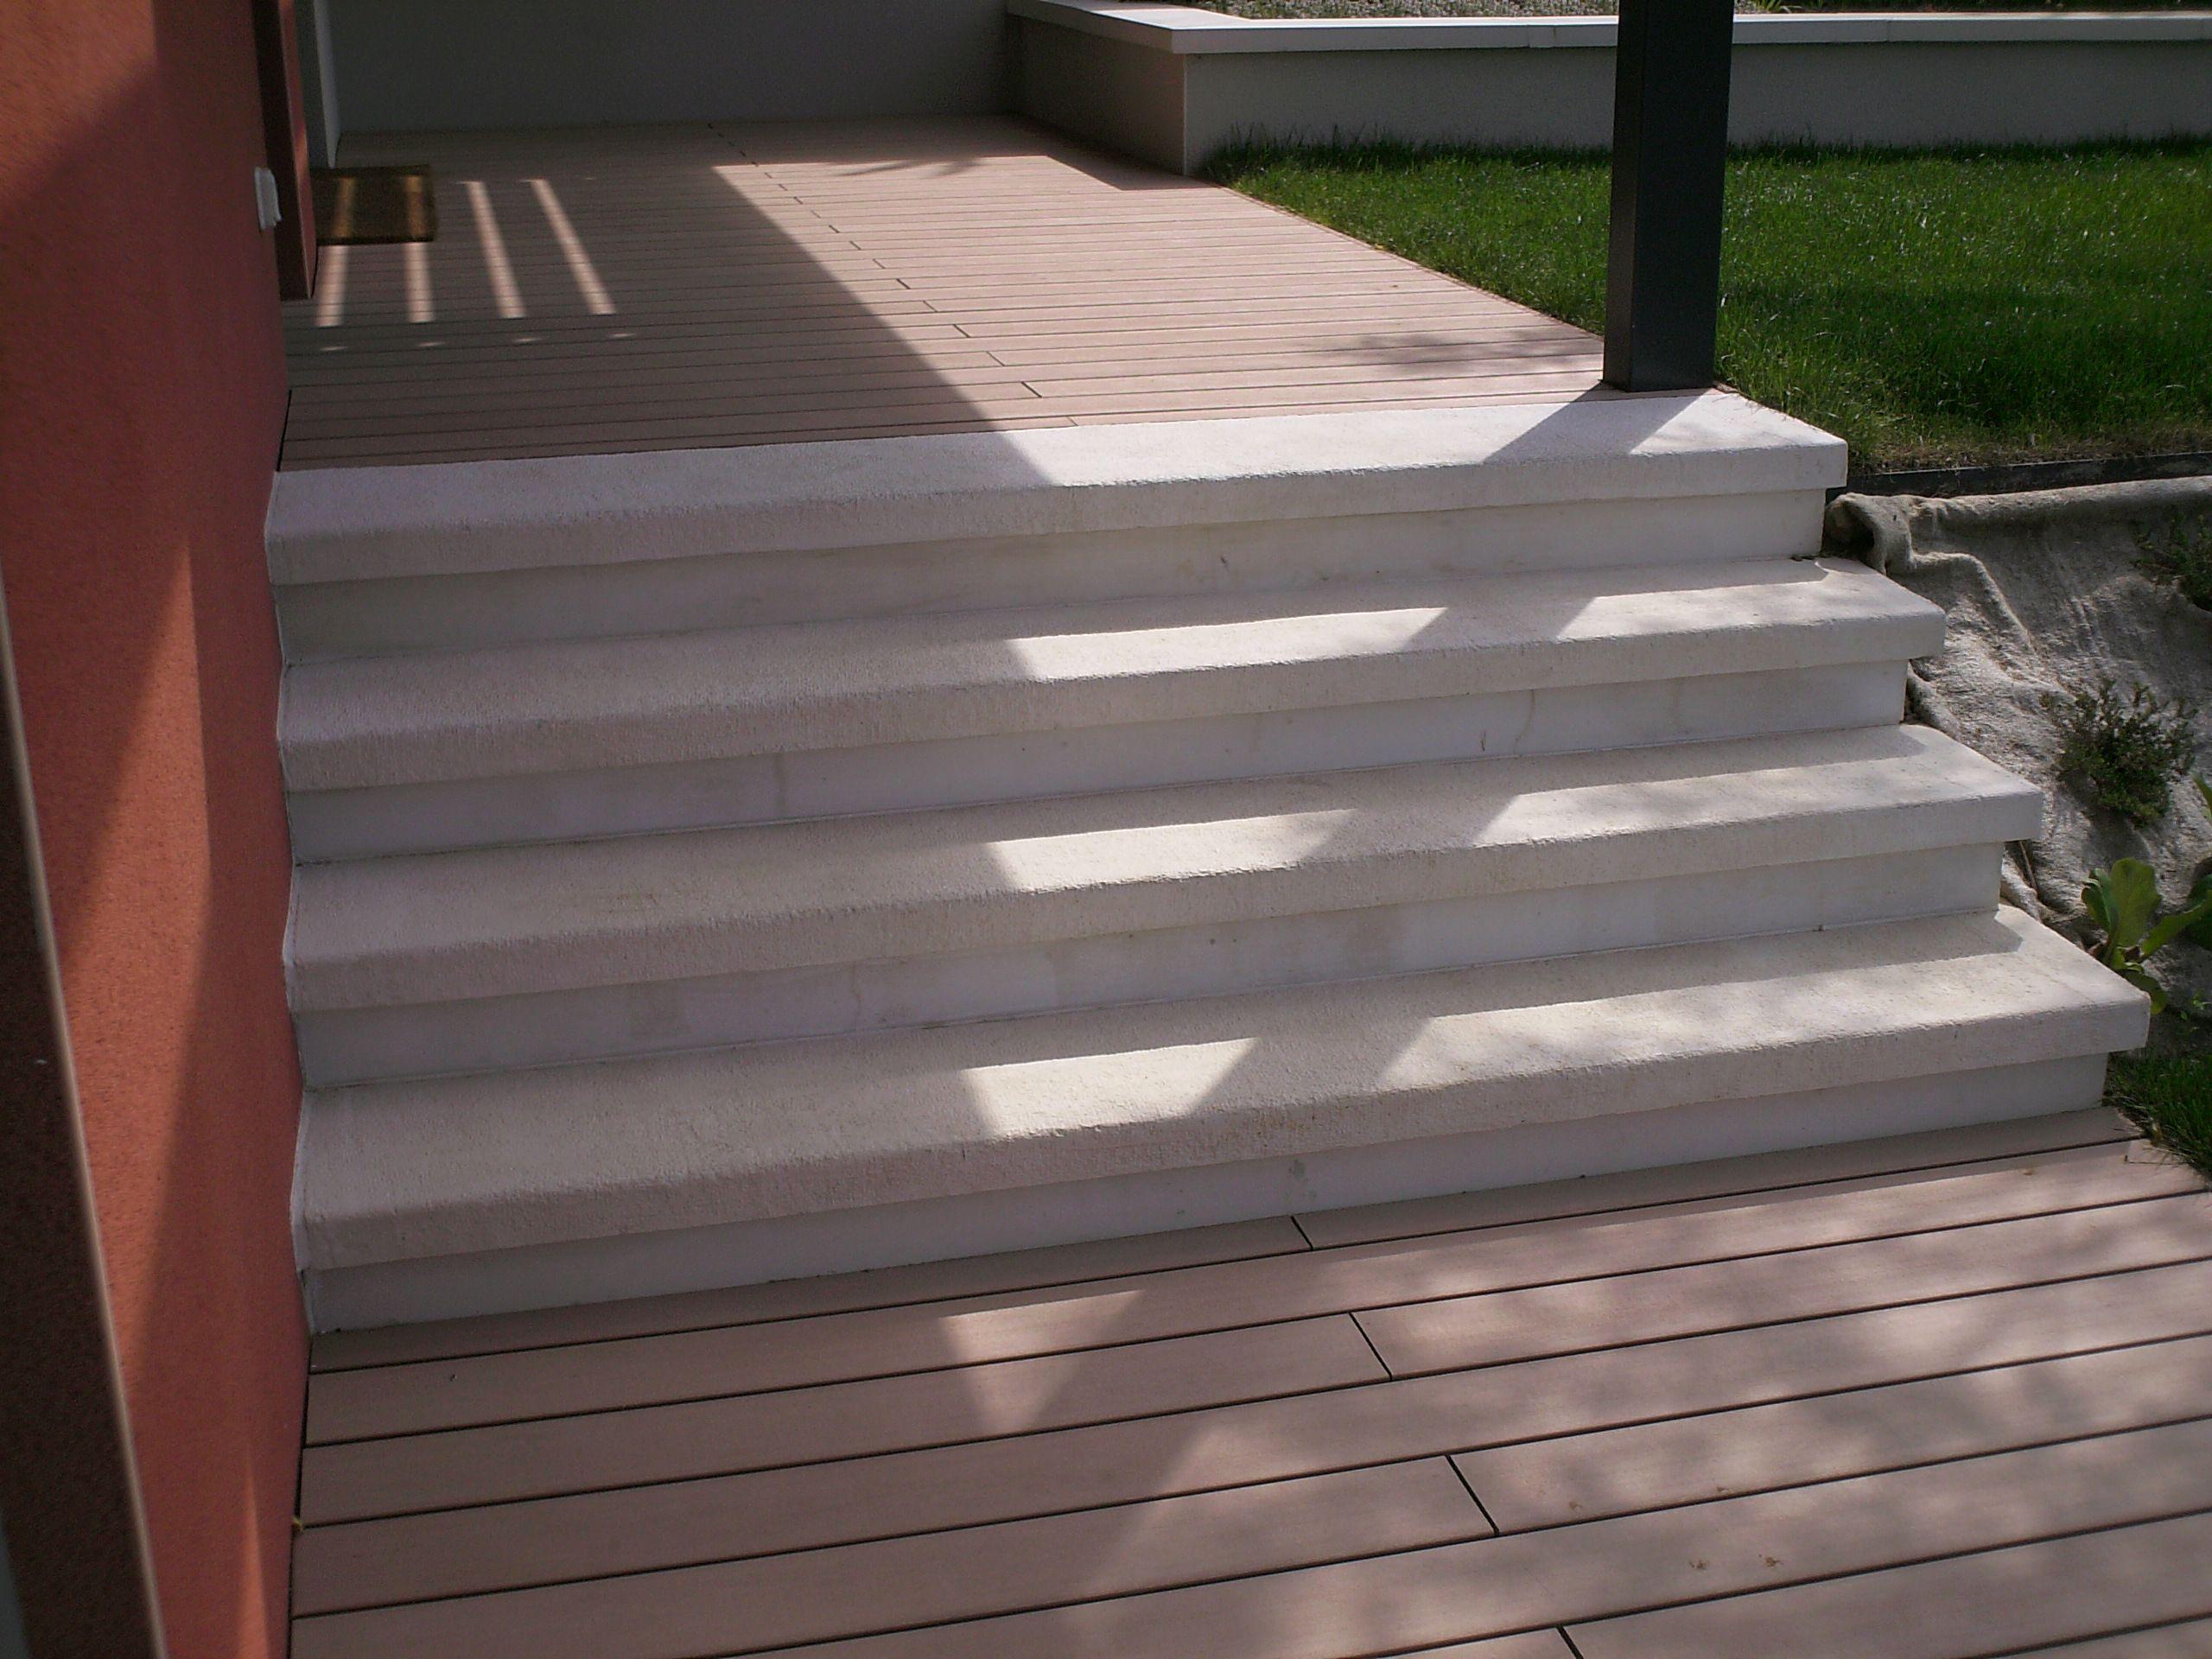 Marche Escalier Plate Aspect Grenaille Antiderapant En Pierre Reconstituee Habillage Escalier Beton Prefabrique Marche Escalier